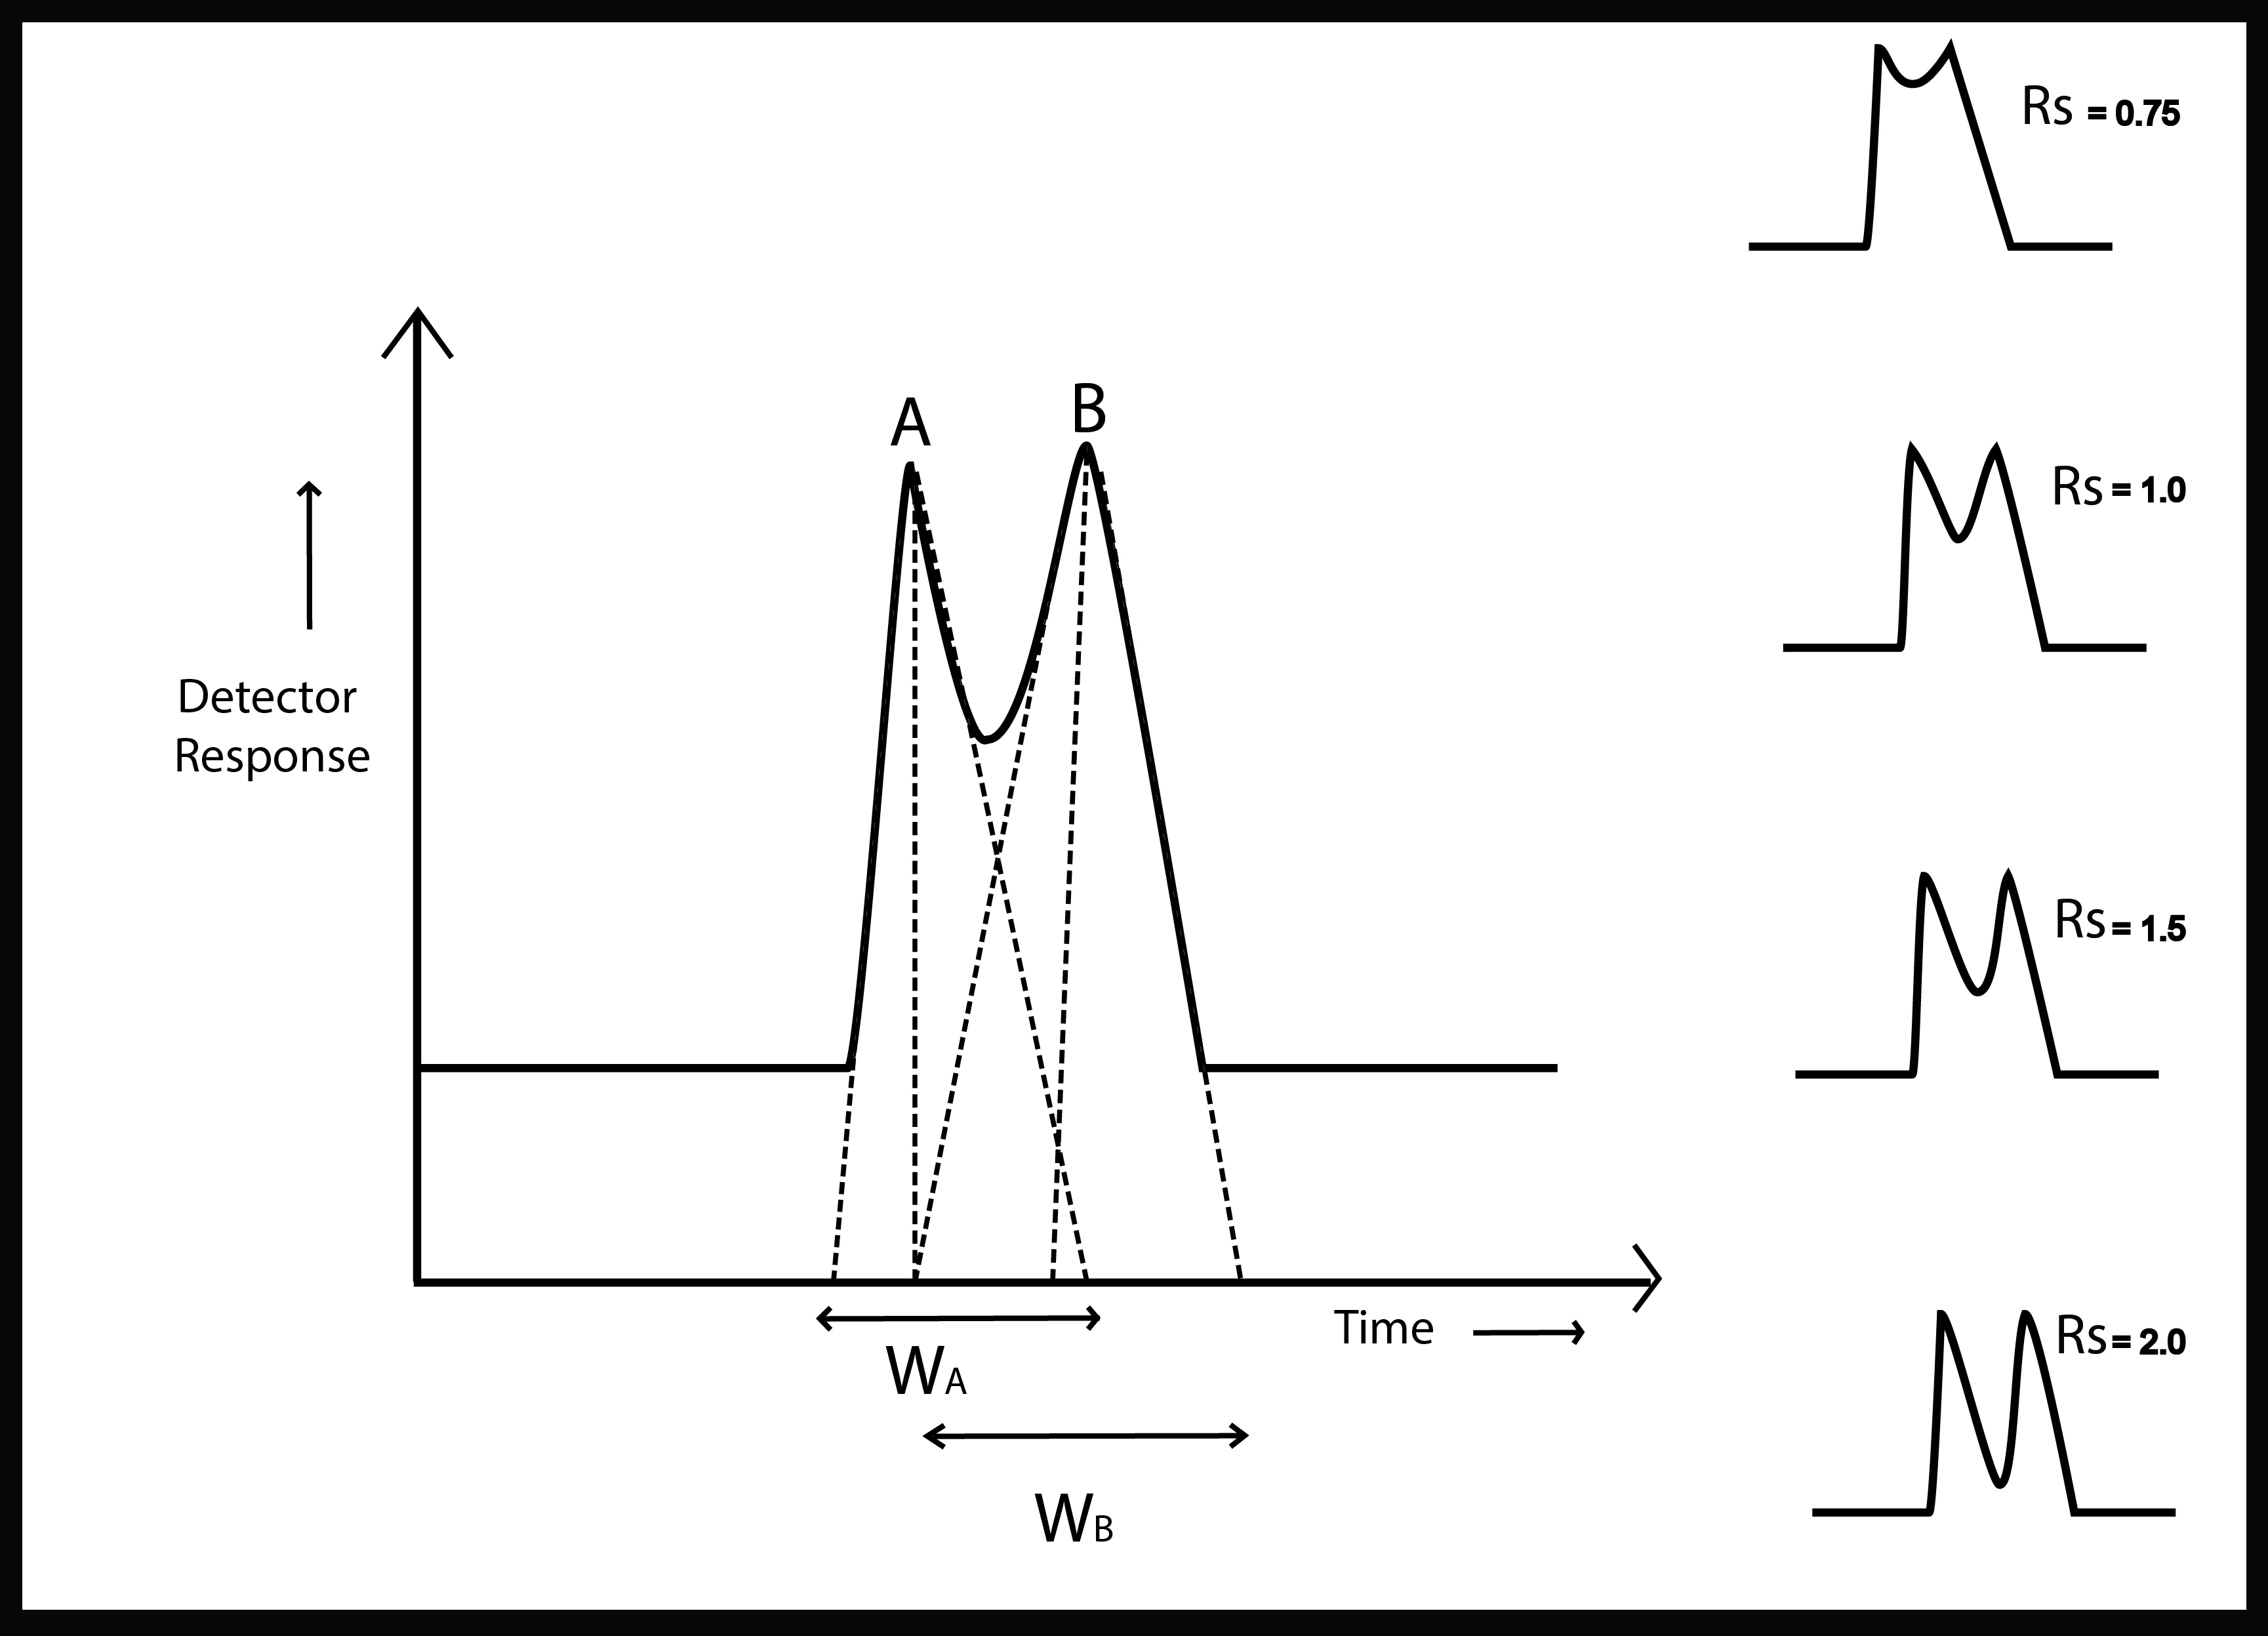 Resolution of Chromatographic Peaks